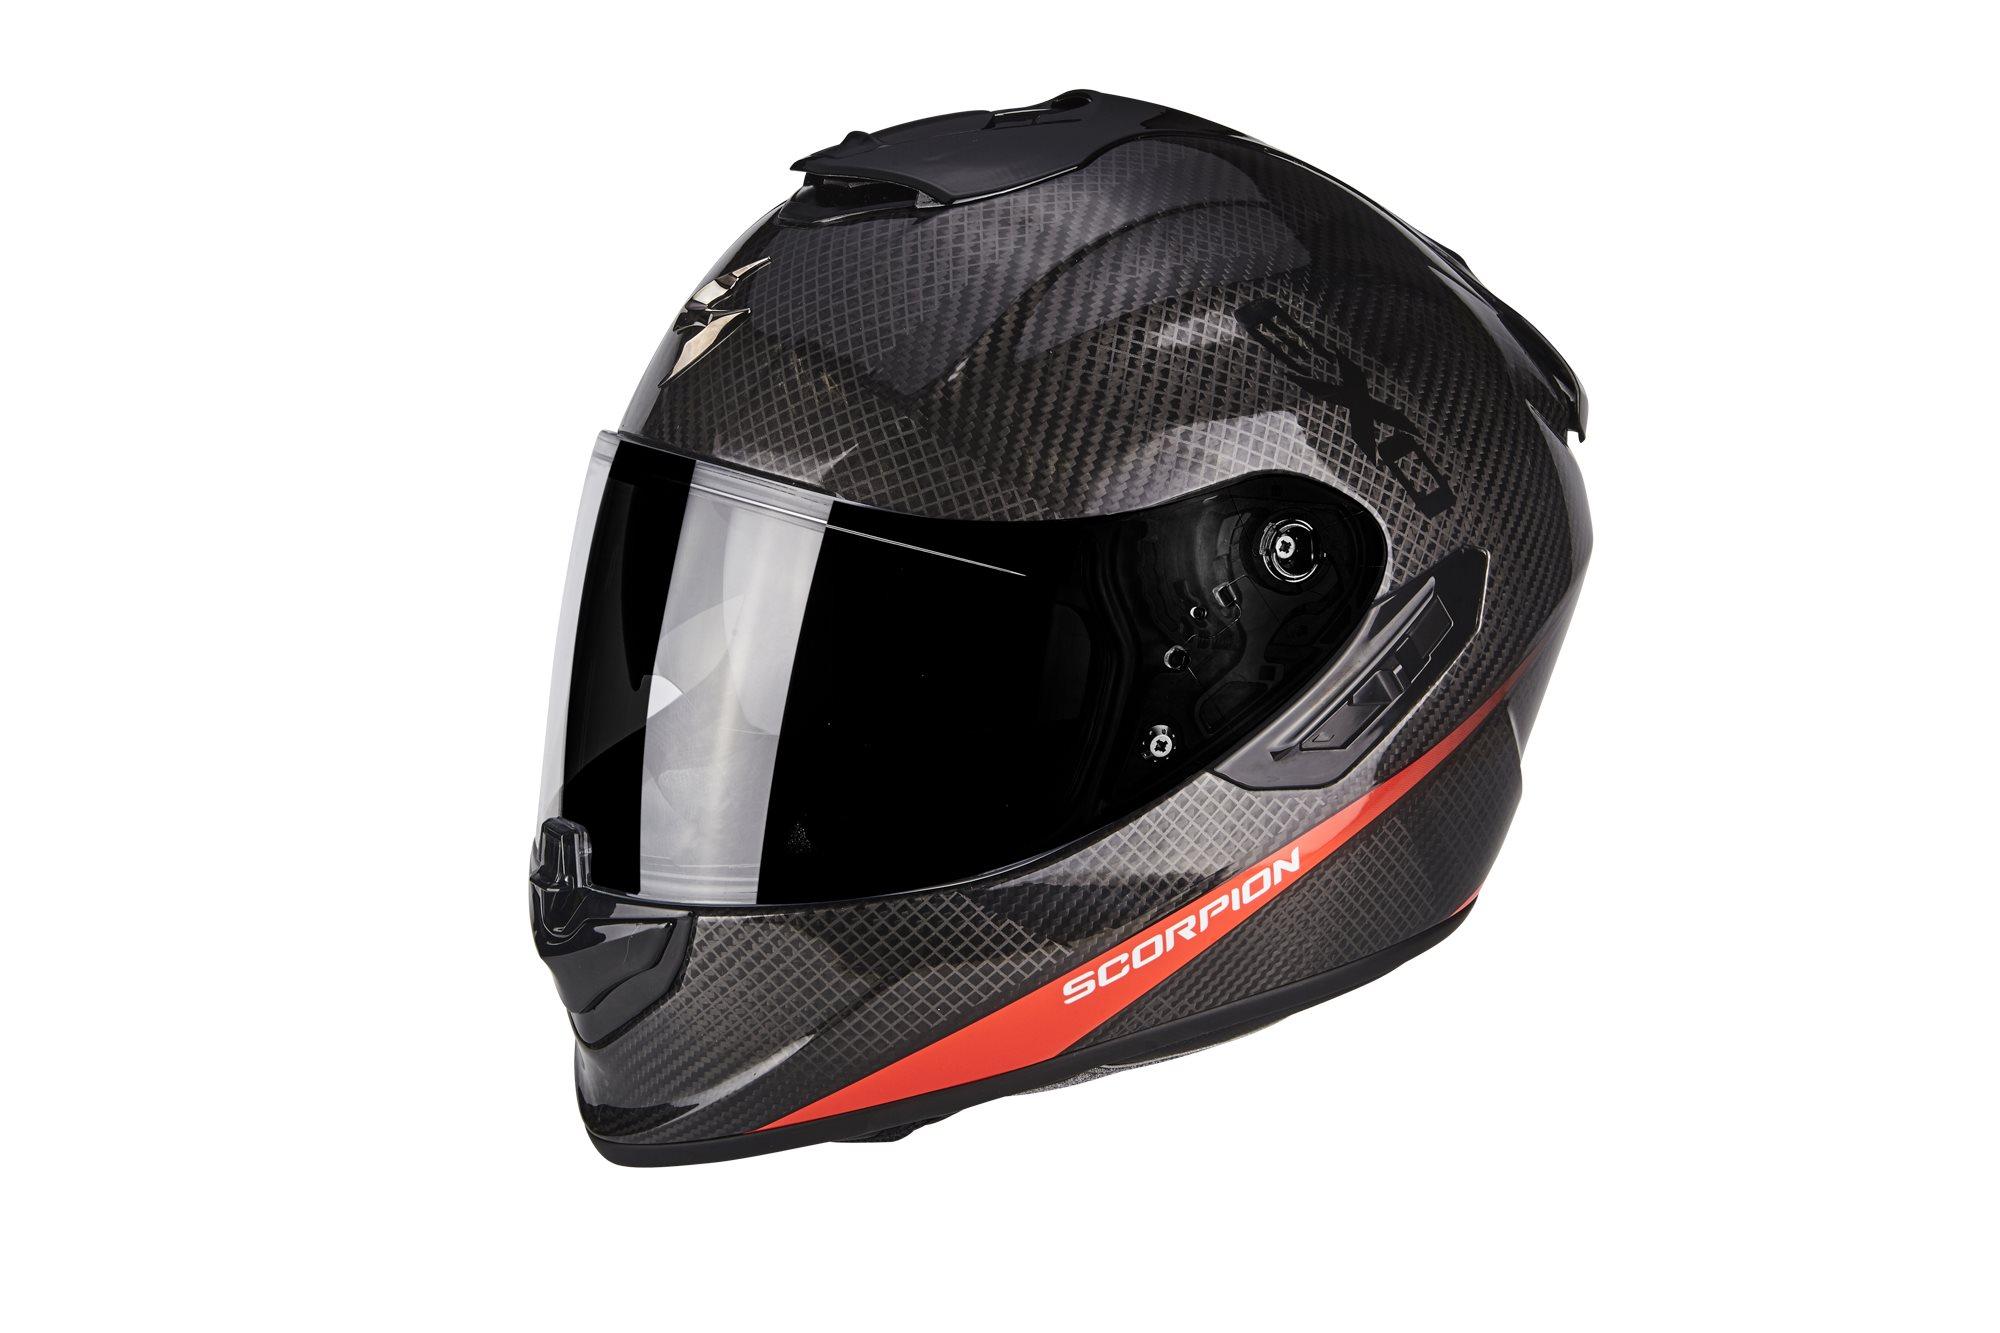 scorpion exo 1400 air air carbon helme 2018 motorrad news. Black Bedroom Furniture Sets. Home Design Ideas